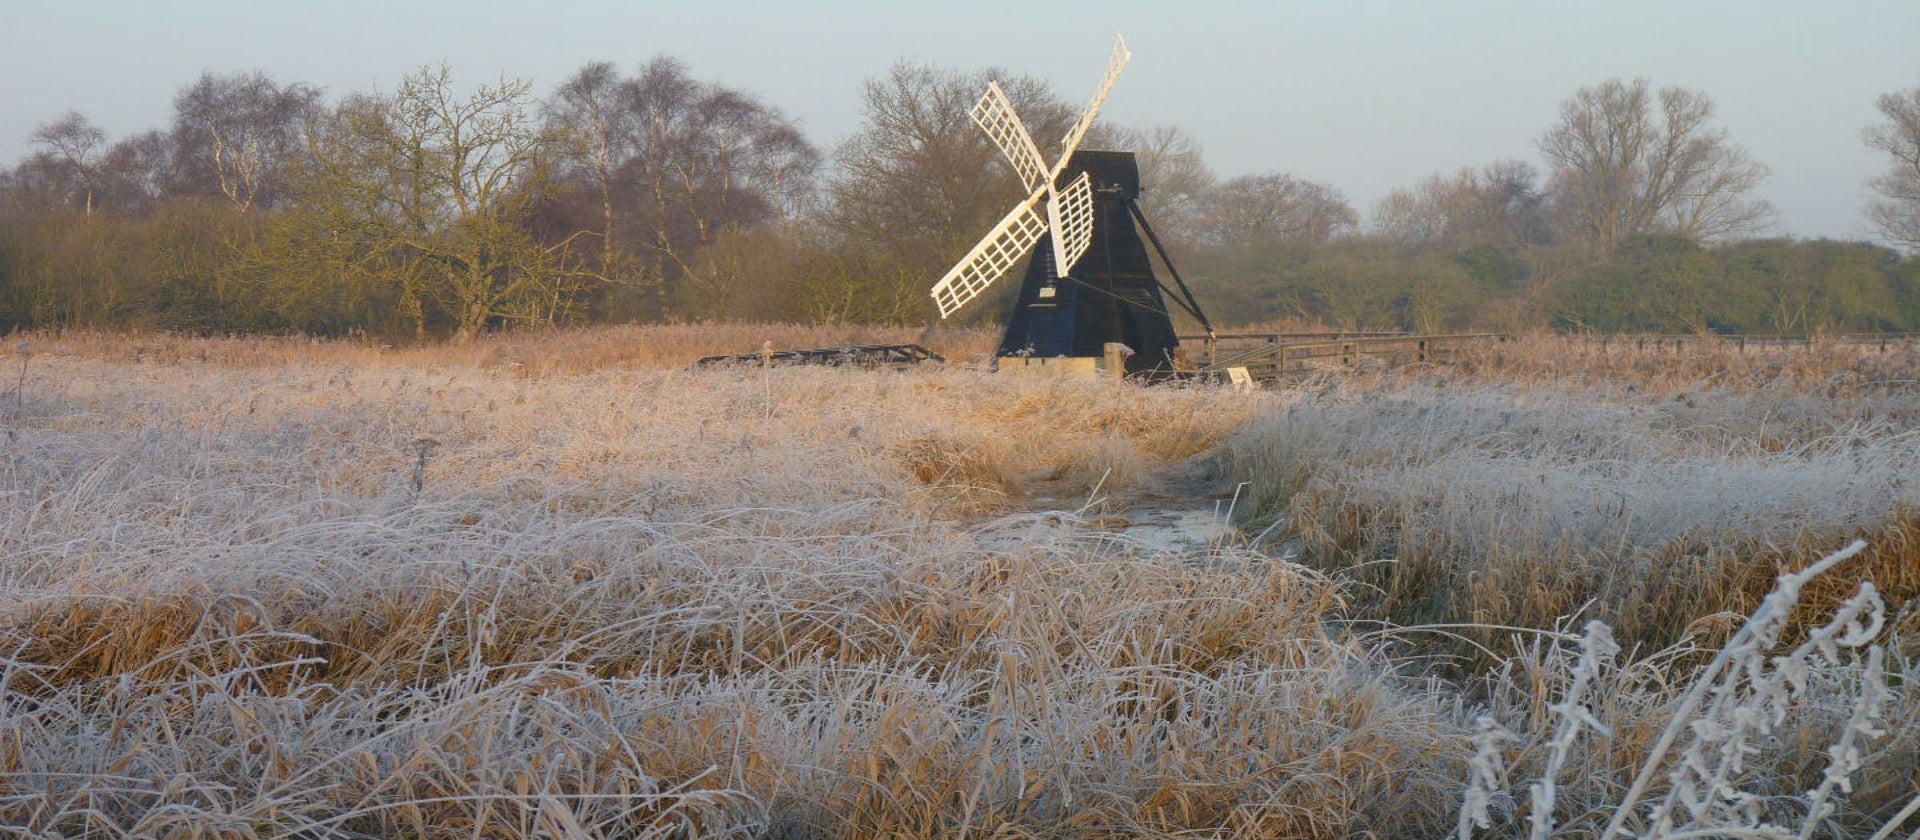 wicken fen windpump in frost